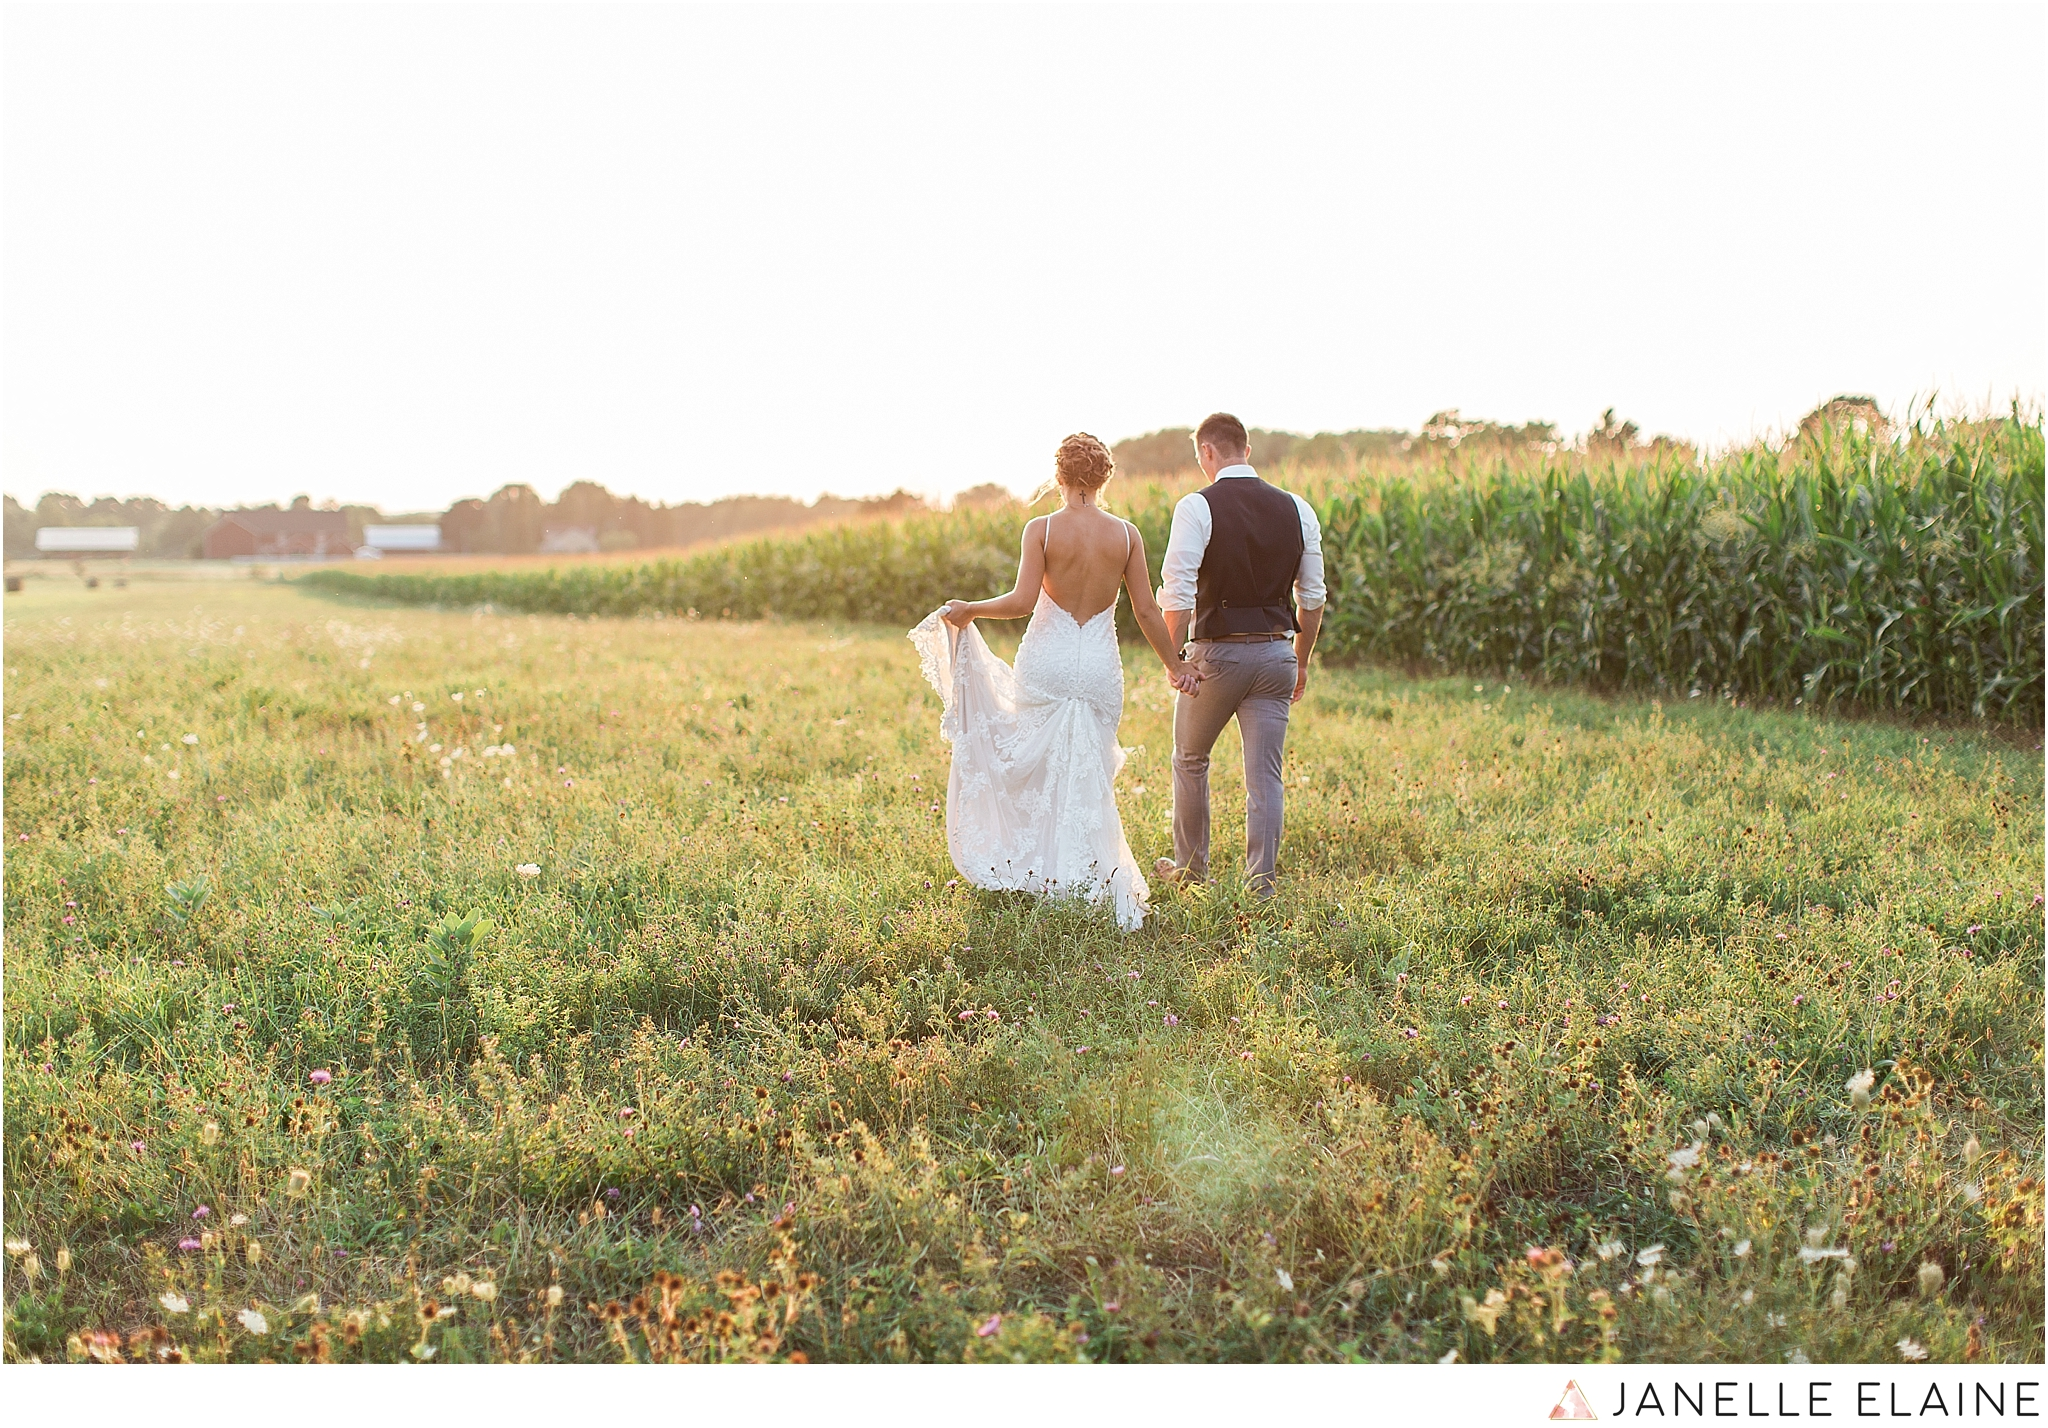 warnsholz-wedding-michigan-photography-janelle elaine photography-213.jpg